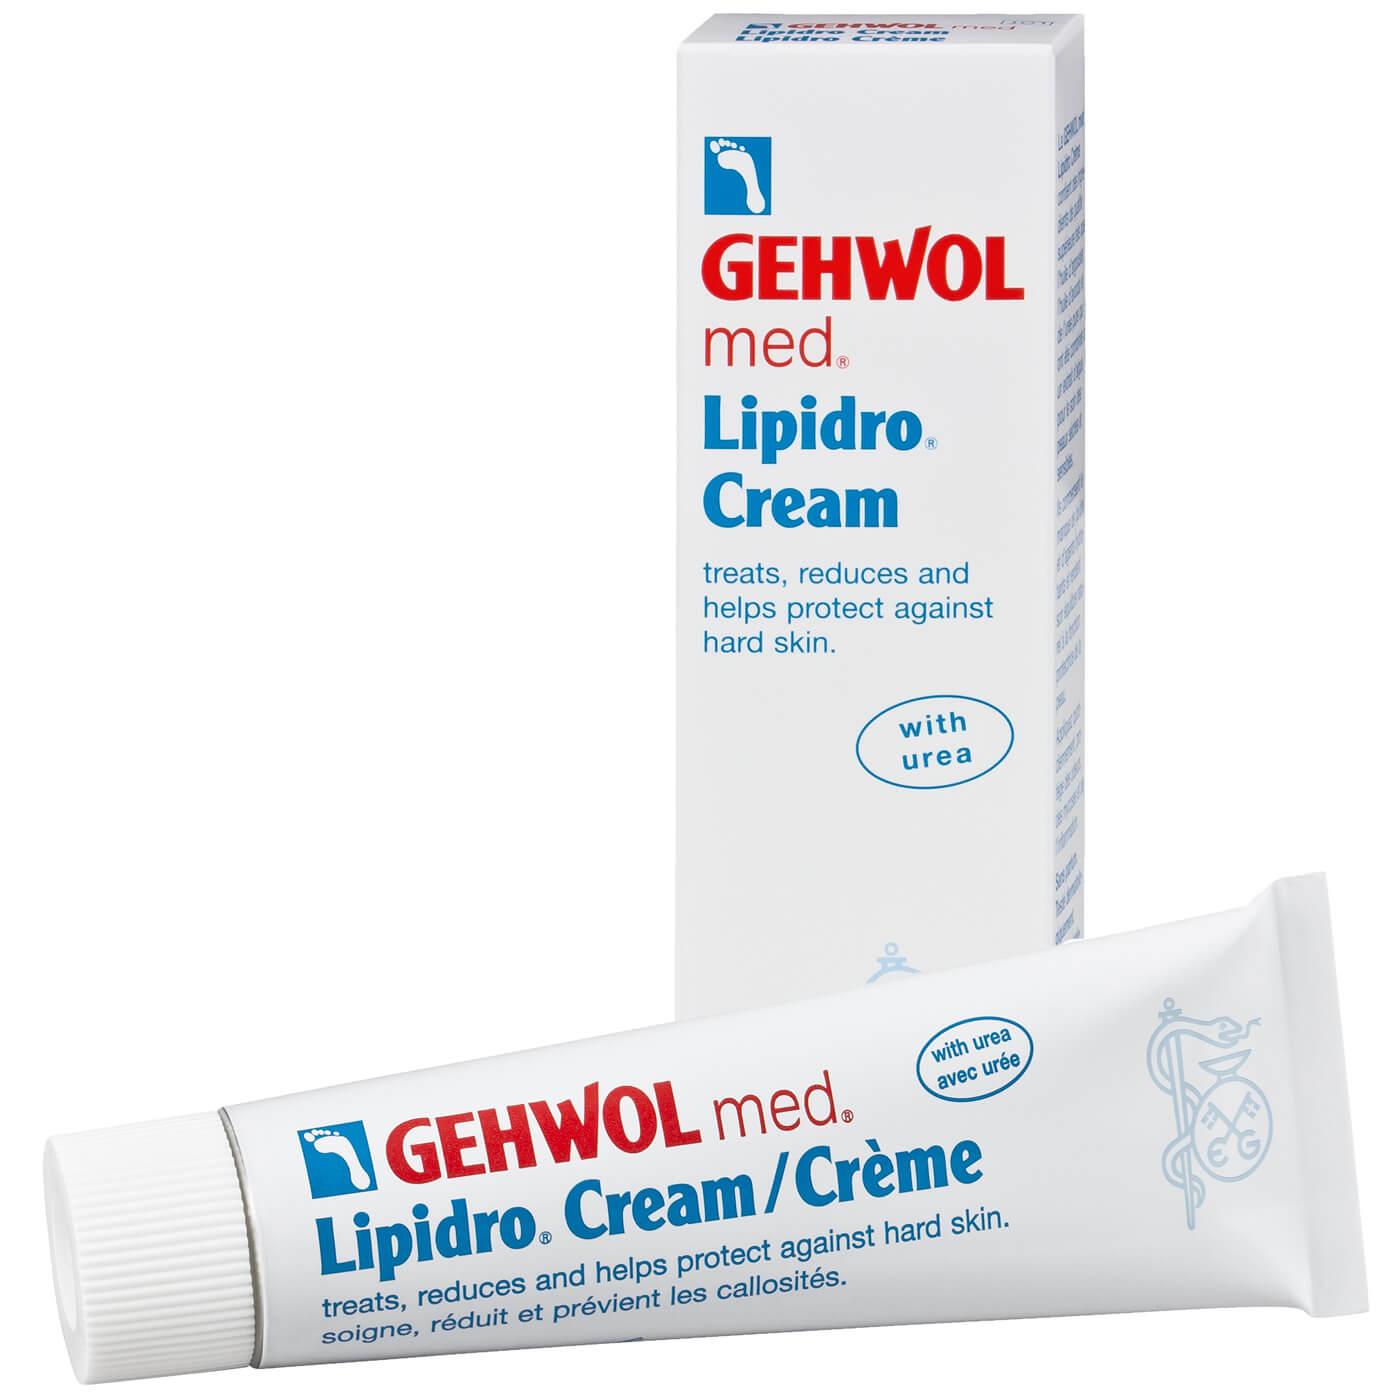 Gehwol Med Lipidro Cream Υδρολιπιδική Κρέμα για Πλούσια Ενυδάτωση – 125ml